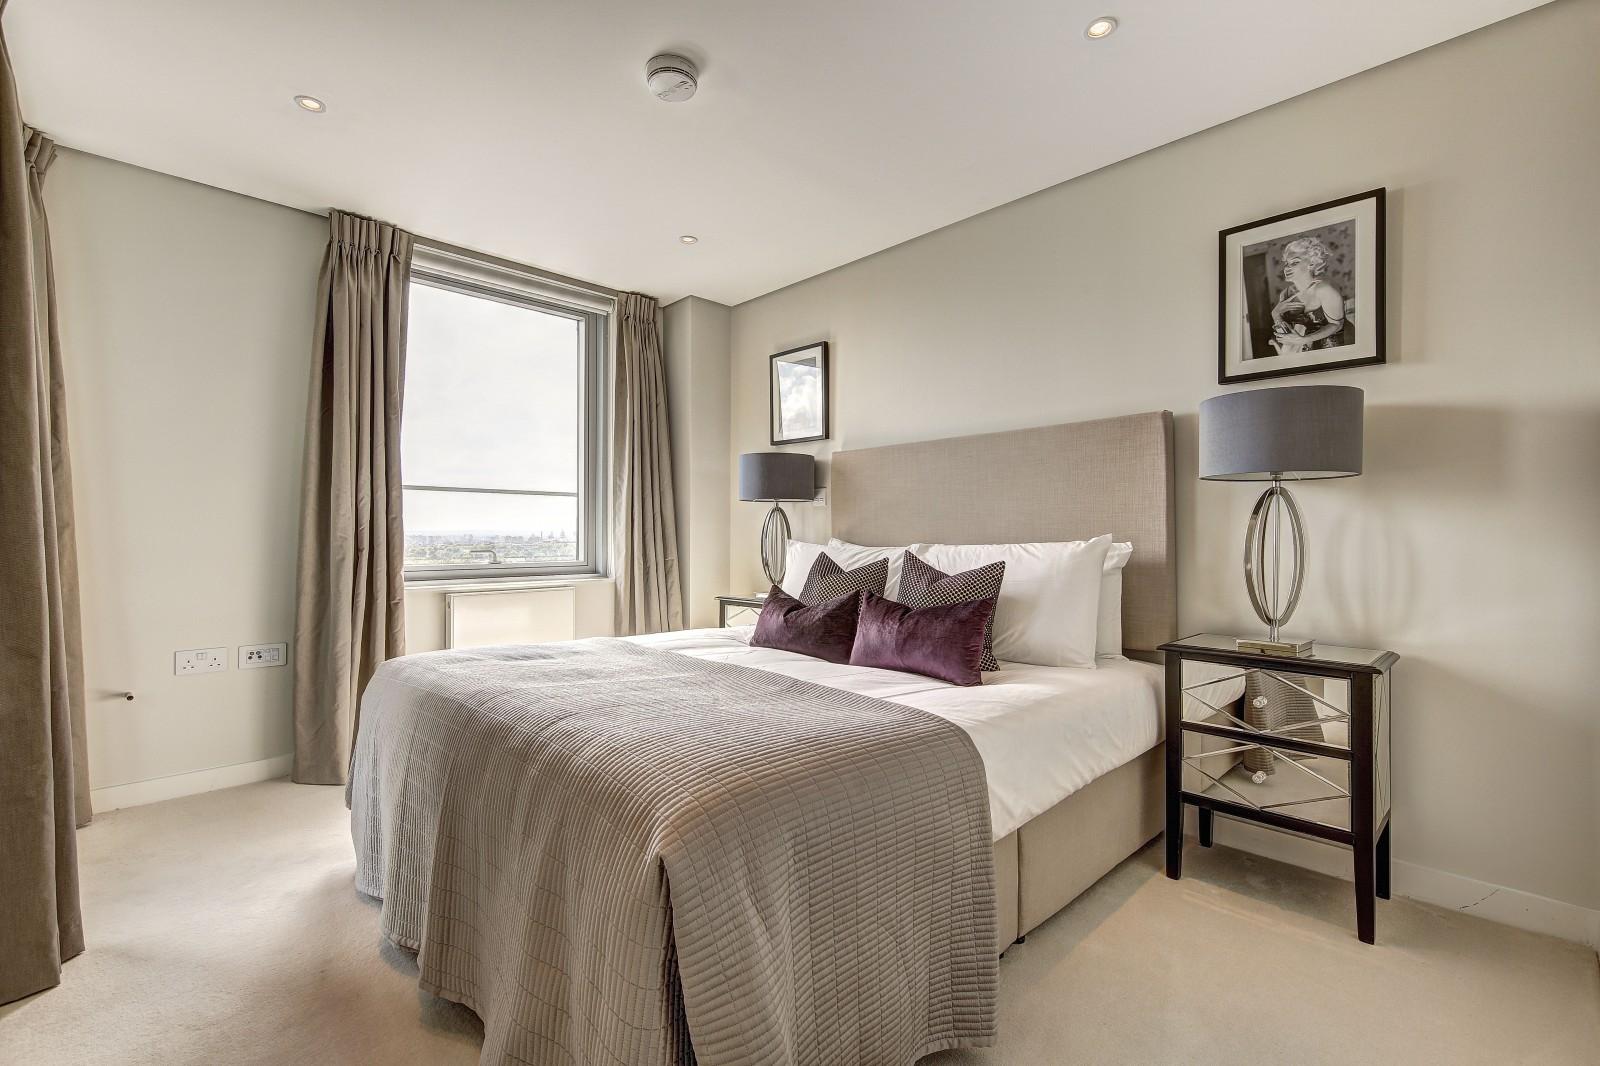 3 Bedroom Apartment To Rent Merchant Square East London W2 1ap